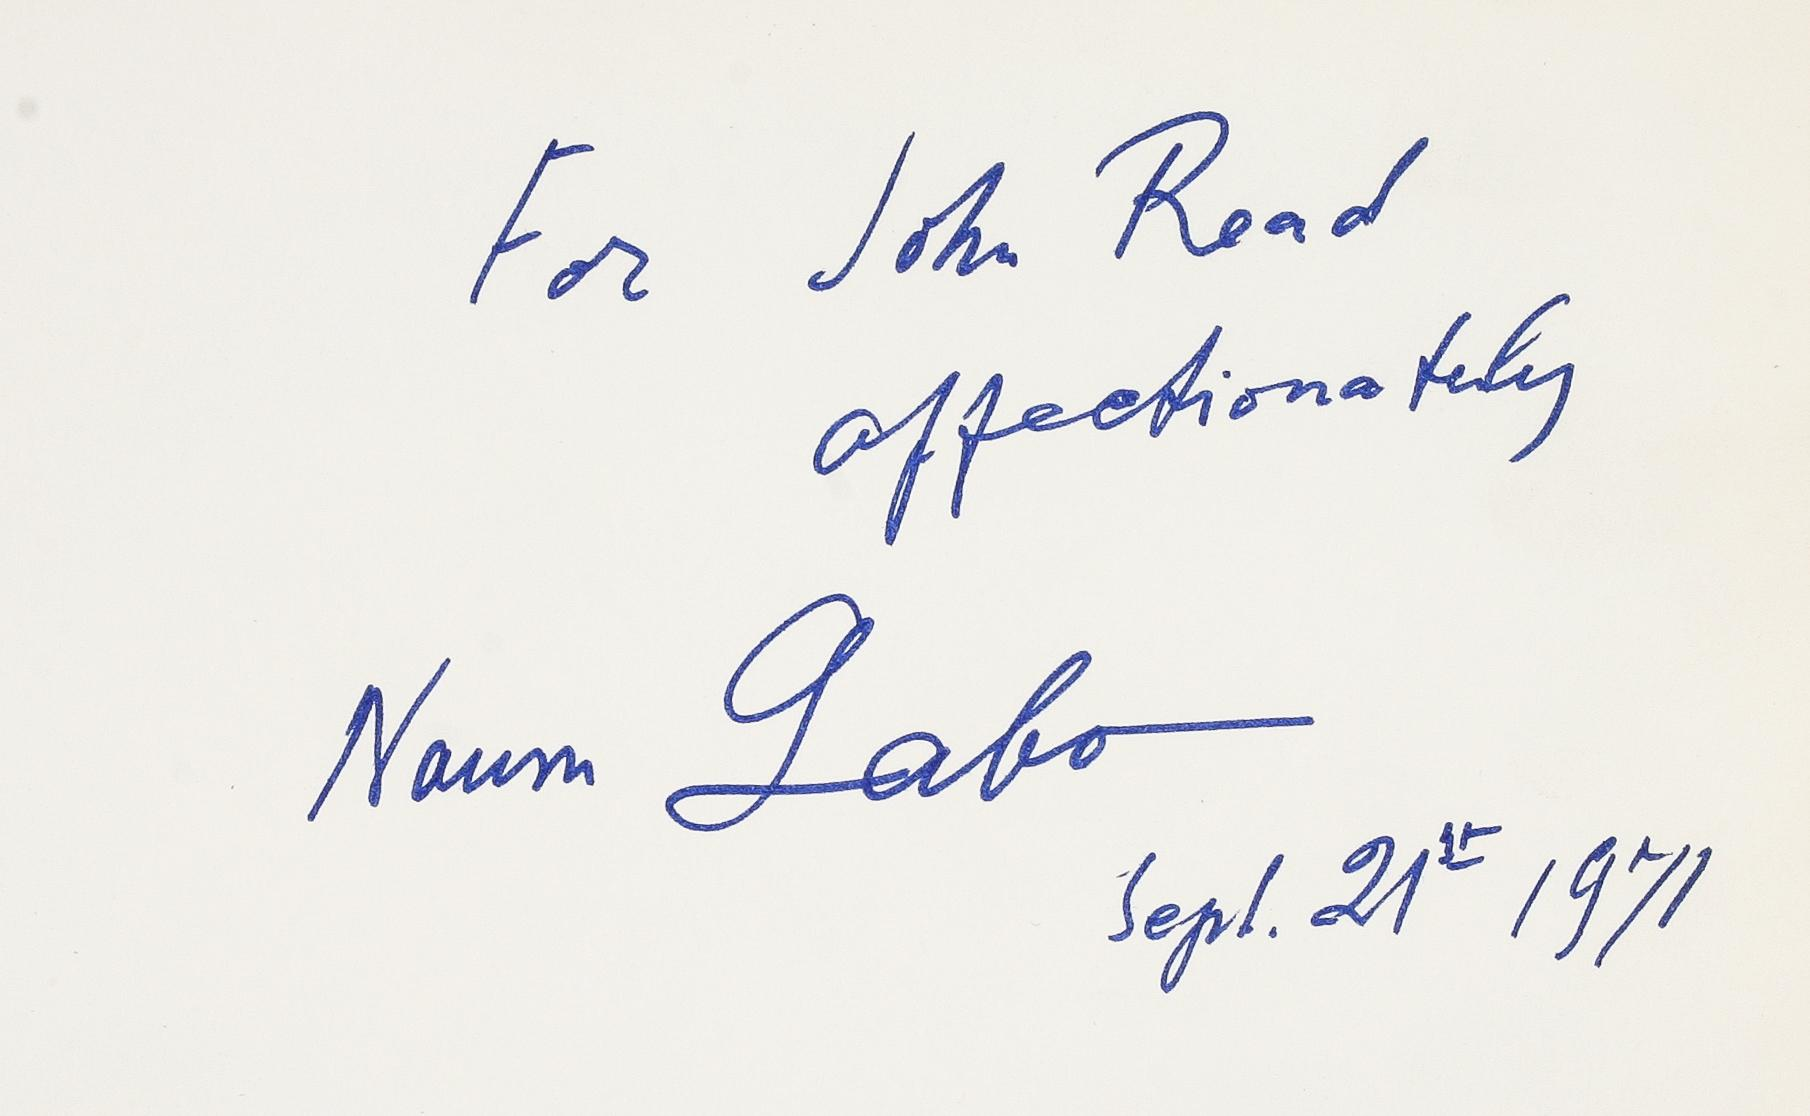 Constructions, Sculpture, Paintings, Drawings, Engravings. GABO Naum.; READ Herbert.; MARTIN Leslie